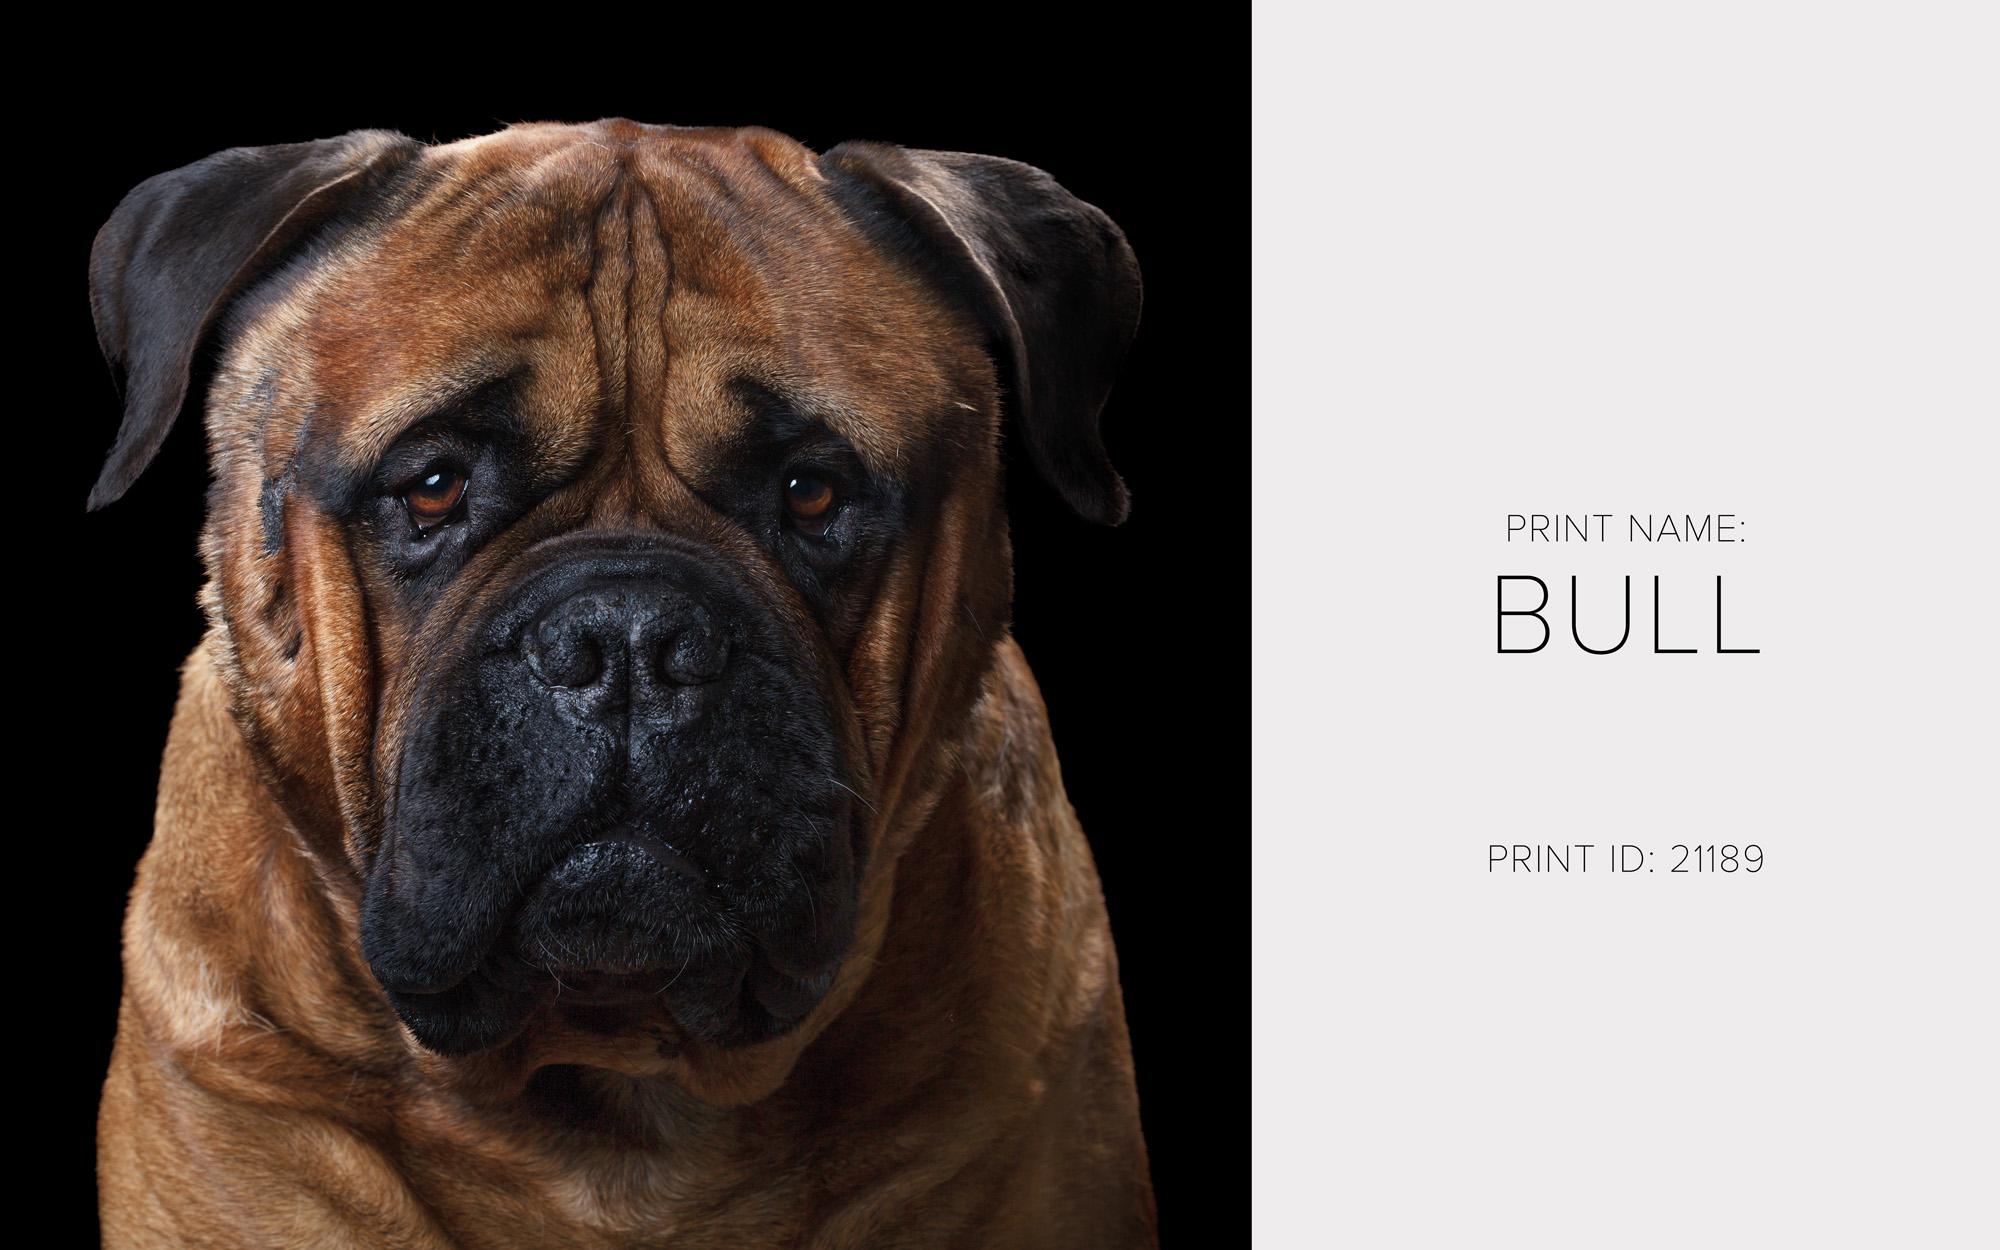 Bull_Print.jpg